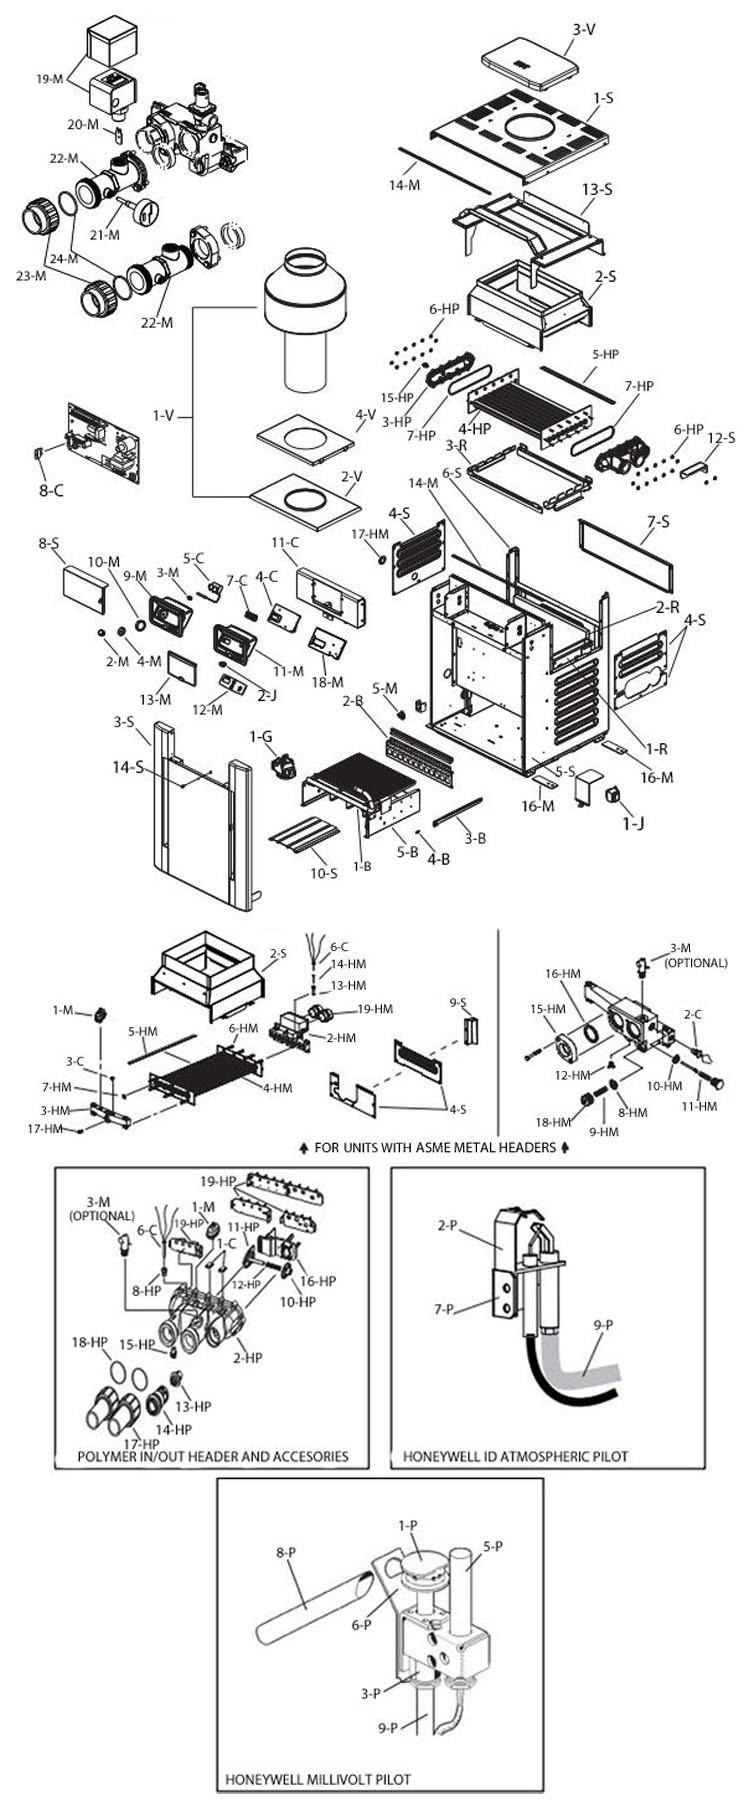 Raypak Digital Natural Gas Pool Heater 336k BTU | Electronic Ignition | P-R336A-EN-C 009218 P-M336A-EN-C 009964 Parts Schematic